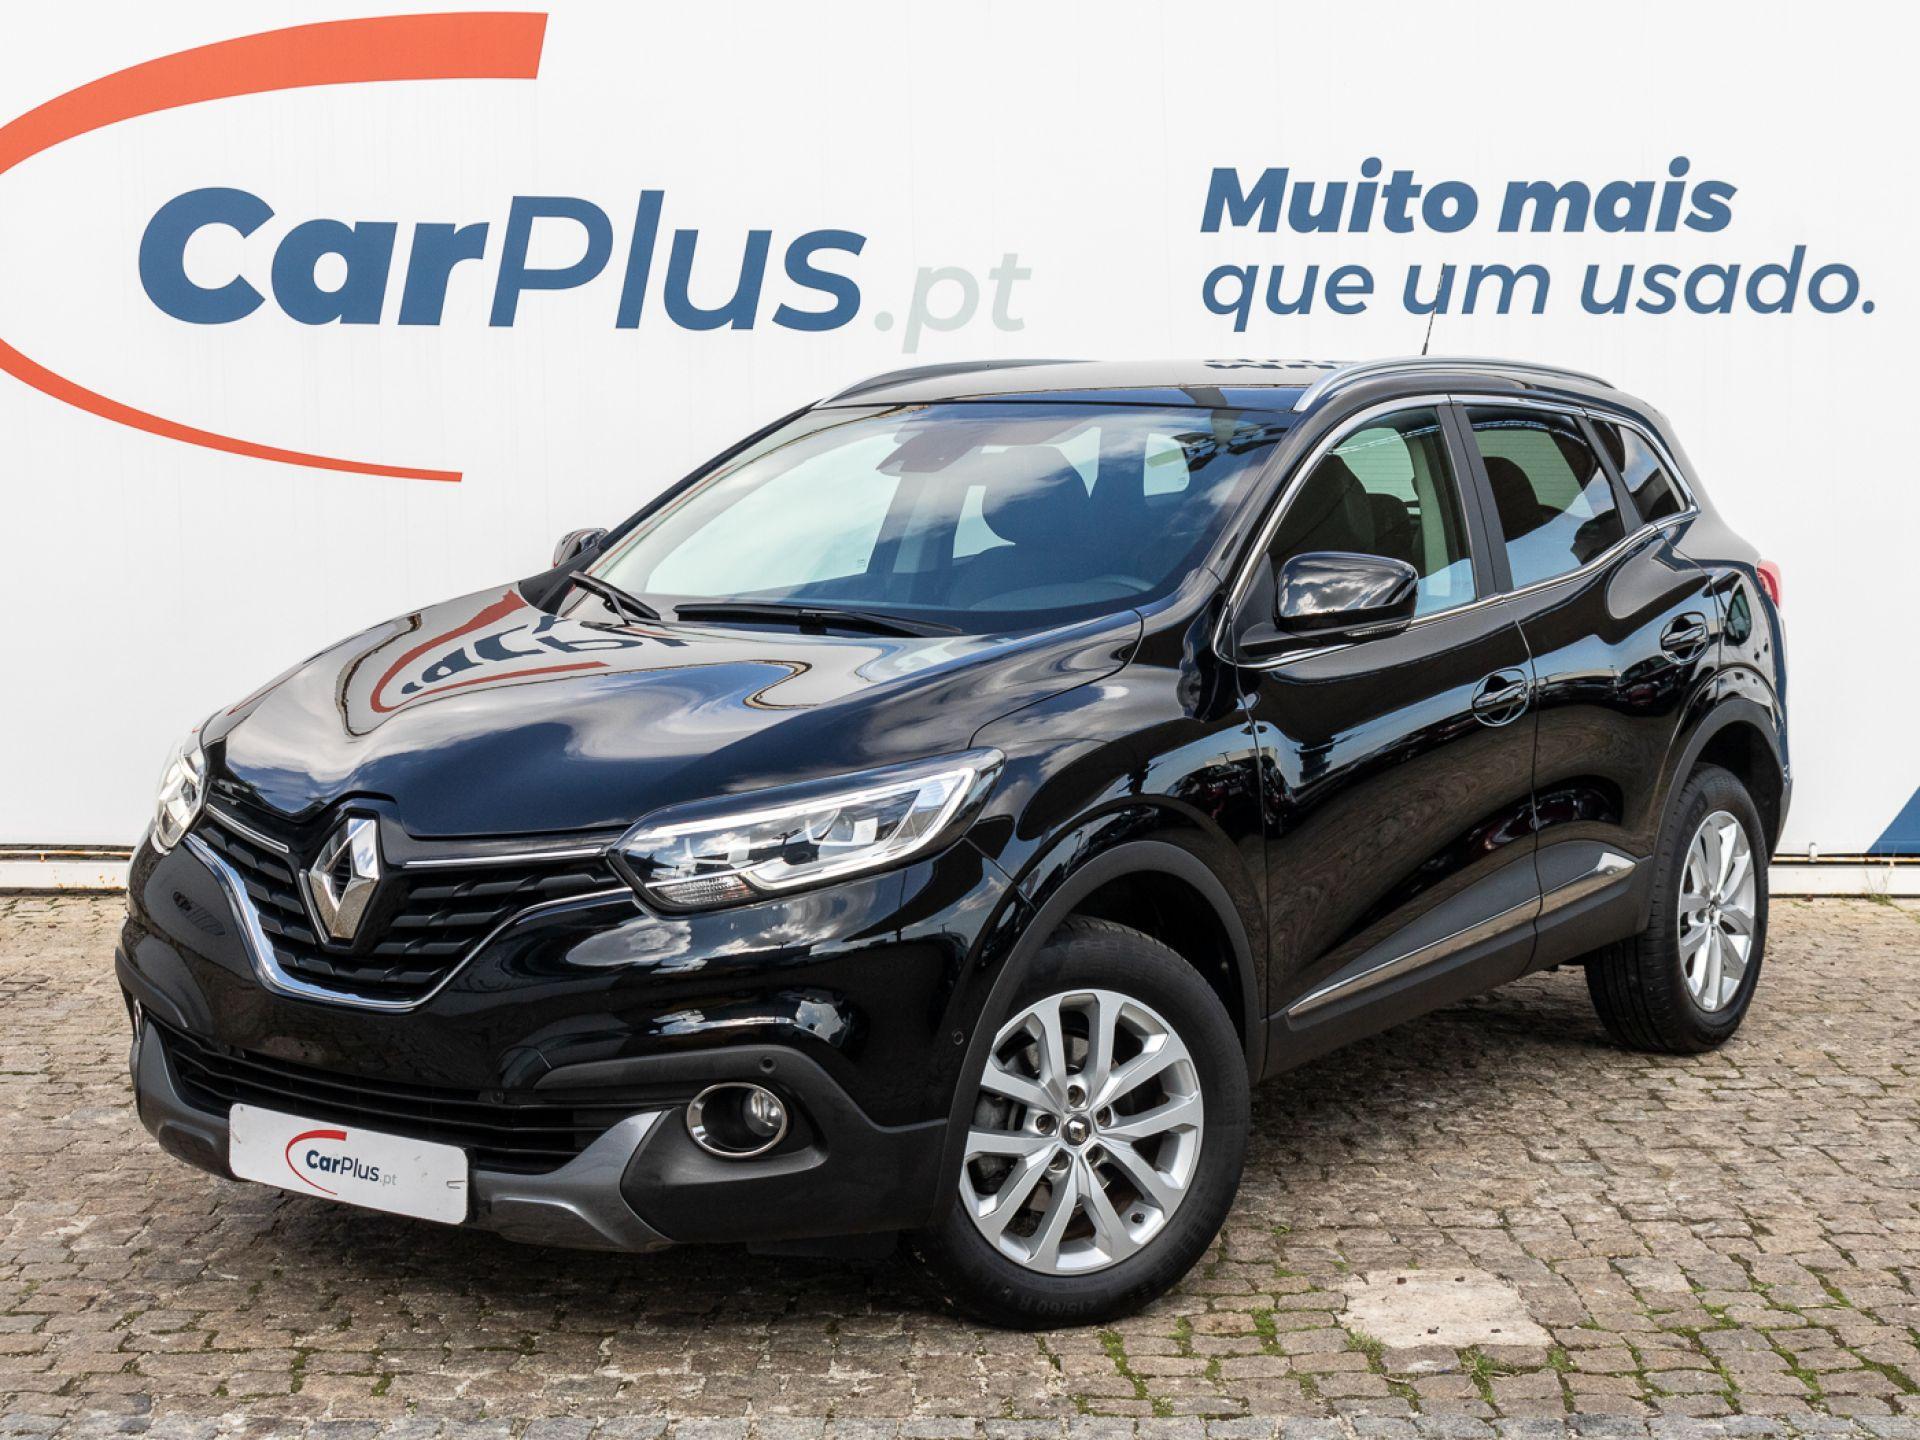 Renault Kadjar 1.5 dCi Energy 110 Exclusive segunda mão Lisboa